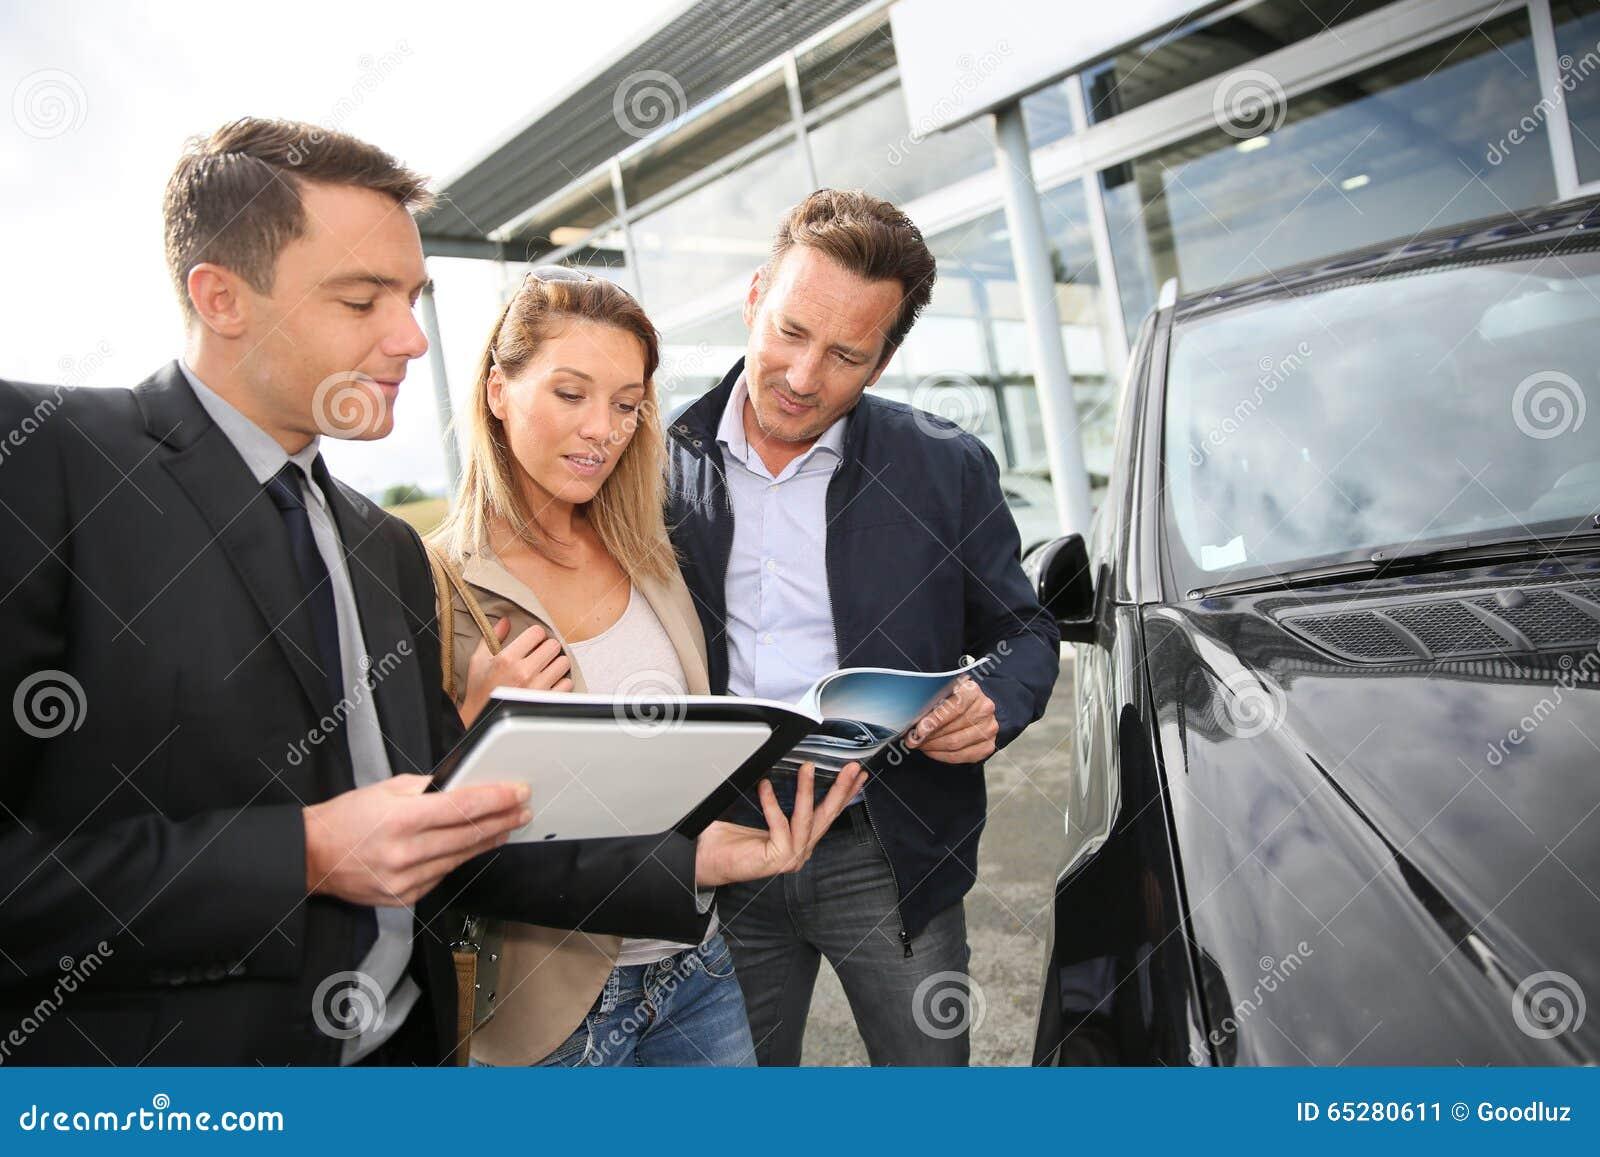 Car Dealer Showing Vehicles On Sale Stock Image - Image of showroom ...